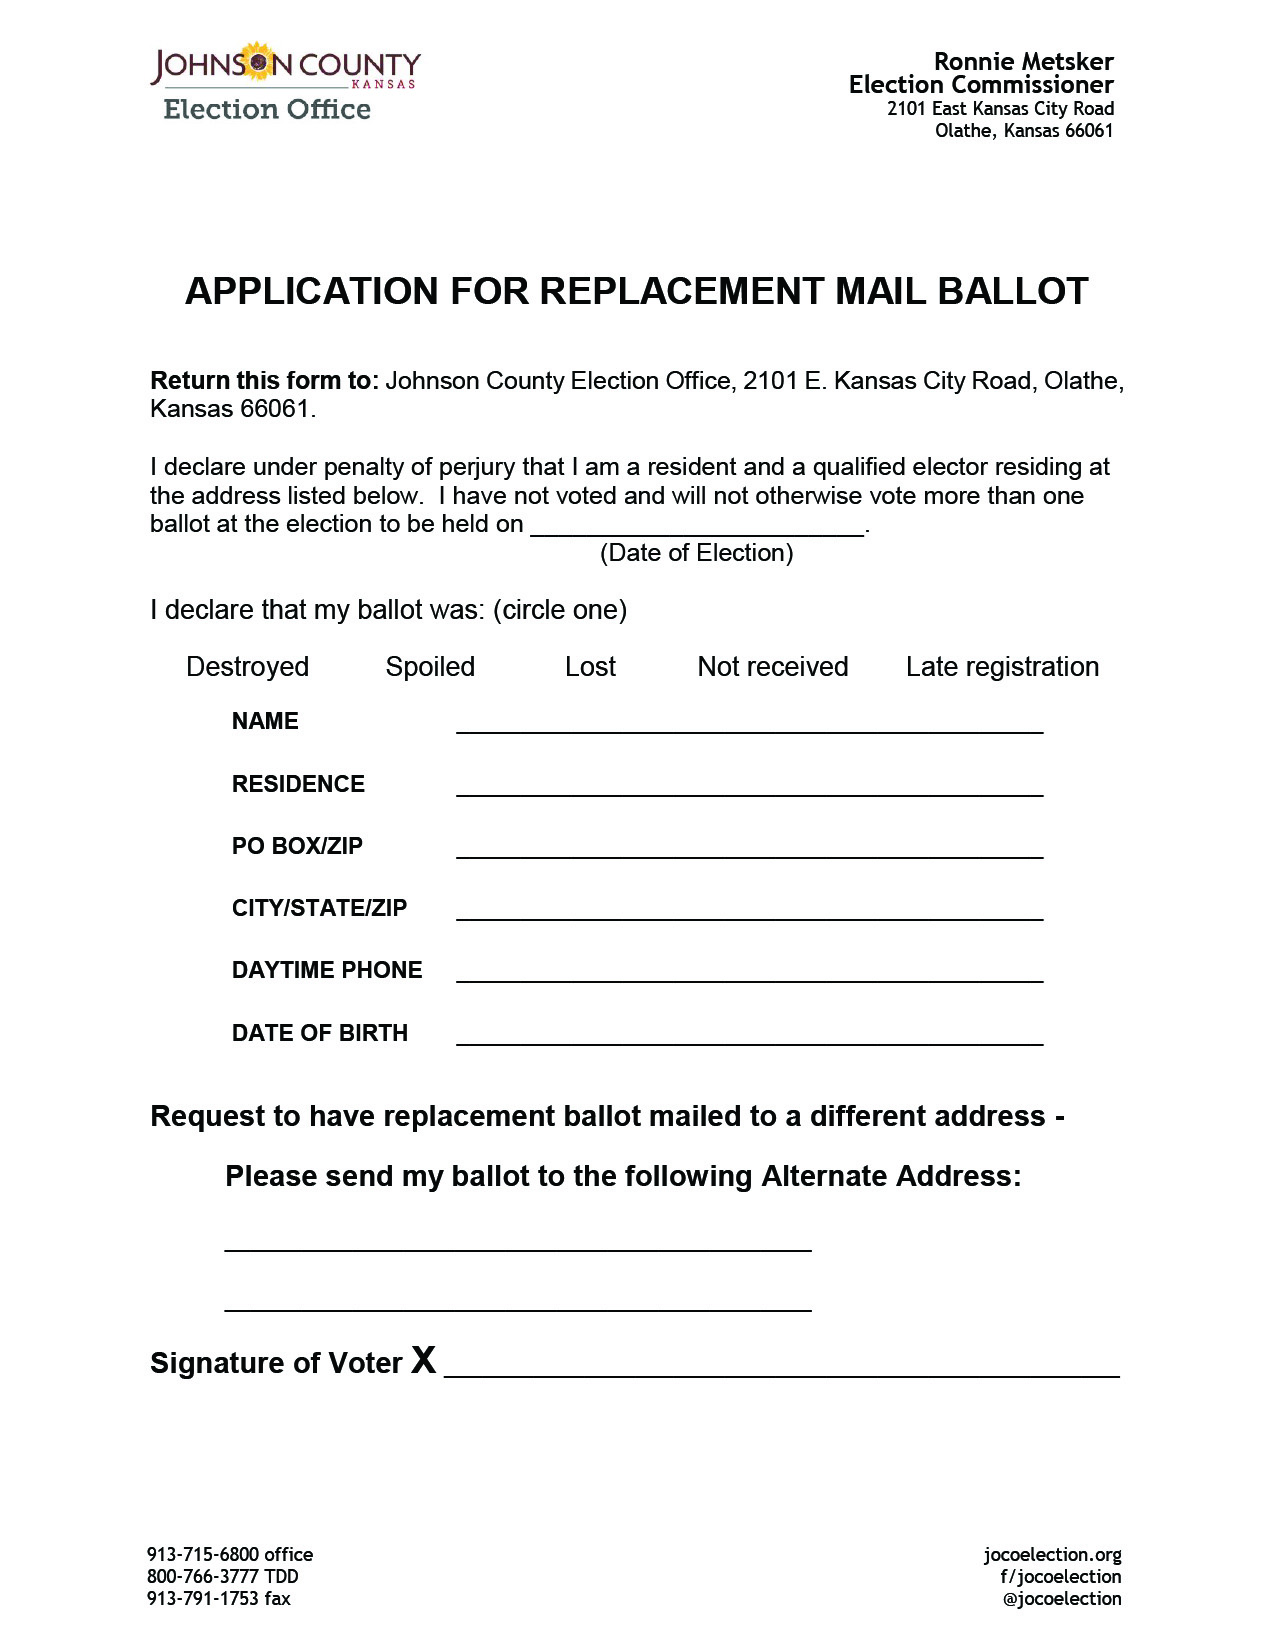 MailBallotReplacementApplication